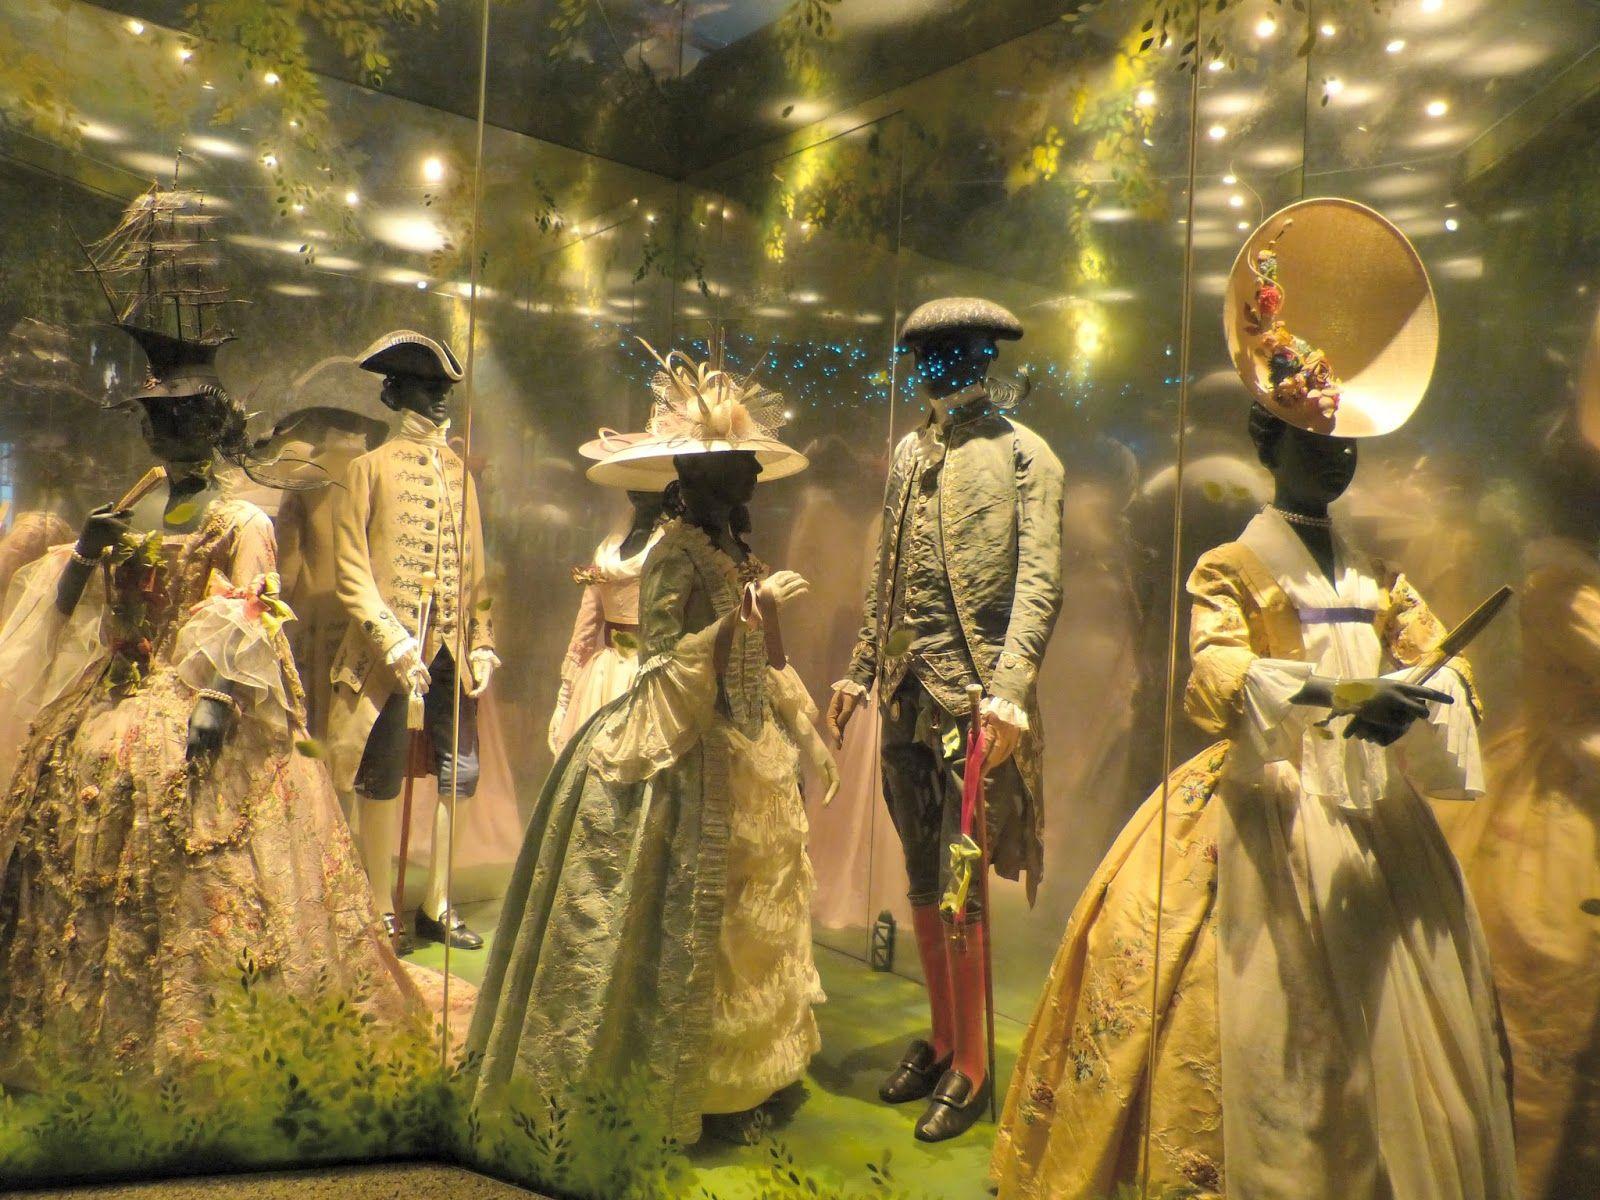 4286b22d0ff66327f617a68f6539da01 - Museum Of London Vauxhall Pleasure Gardens